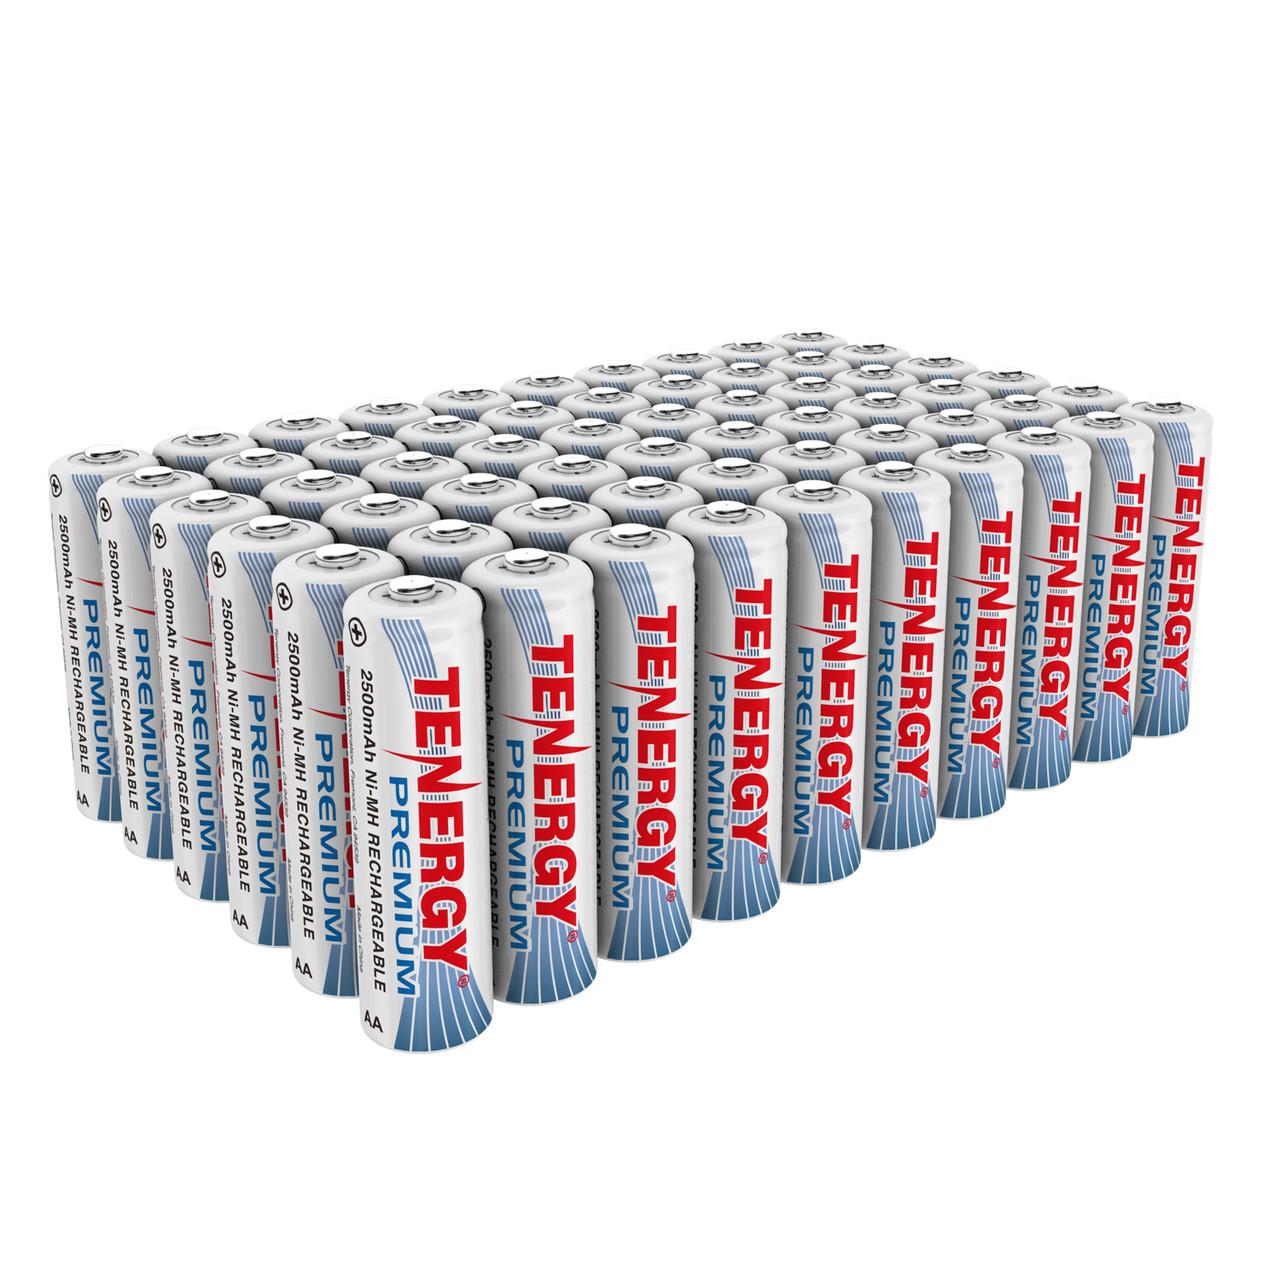 60pcs Tenergy Premium AA 2500mAh NiMH Rechargeable Batteries